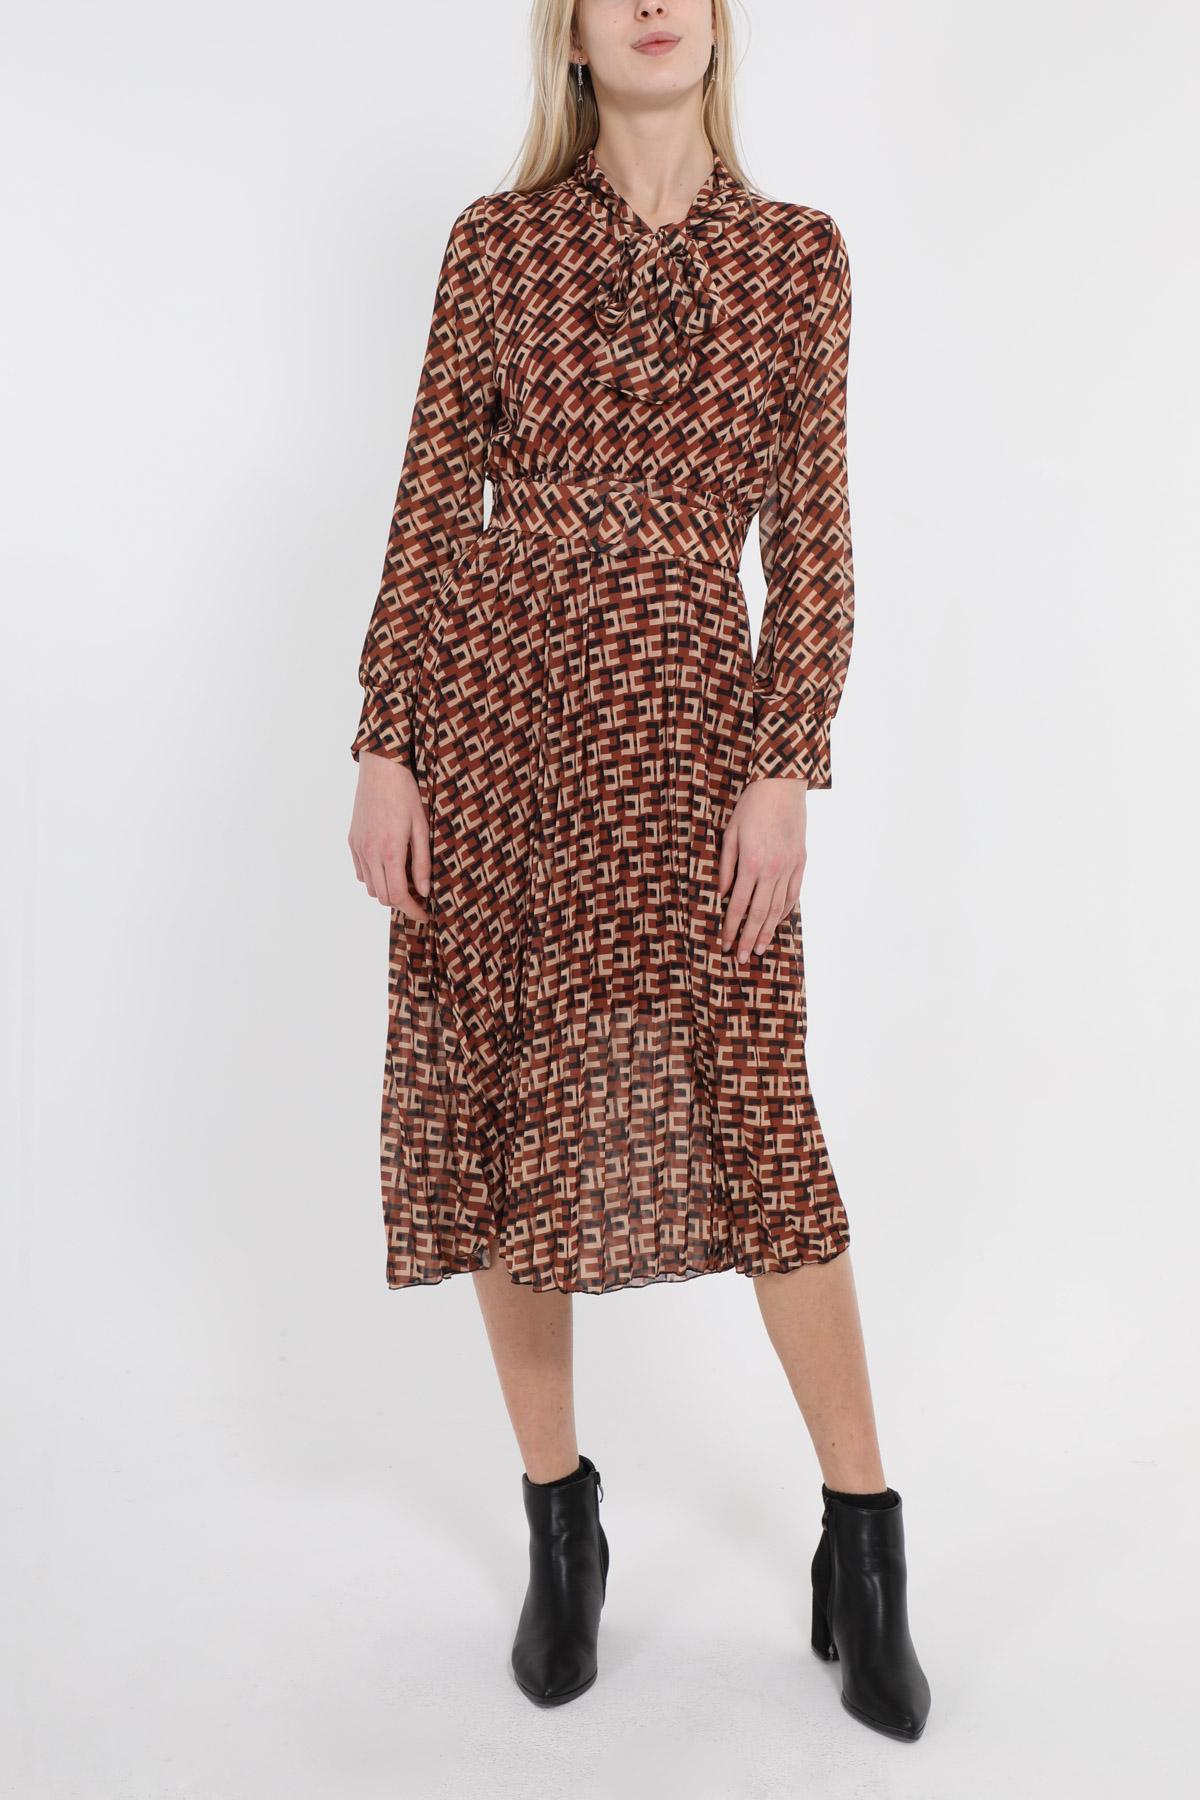 Robes mi-longues Femme Marron PINKA 2309 #c eFashion Paris